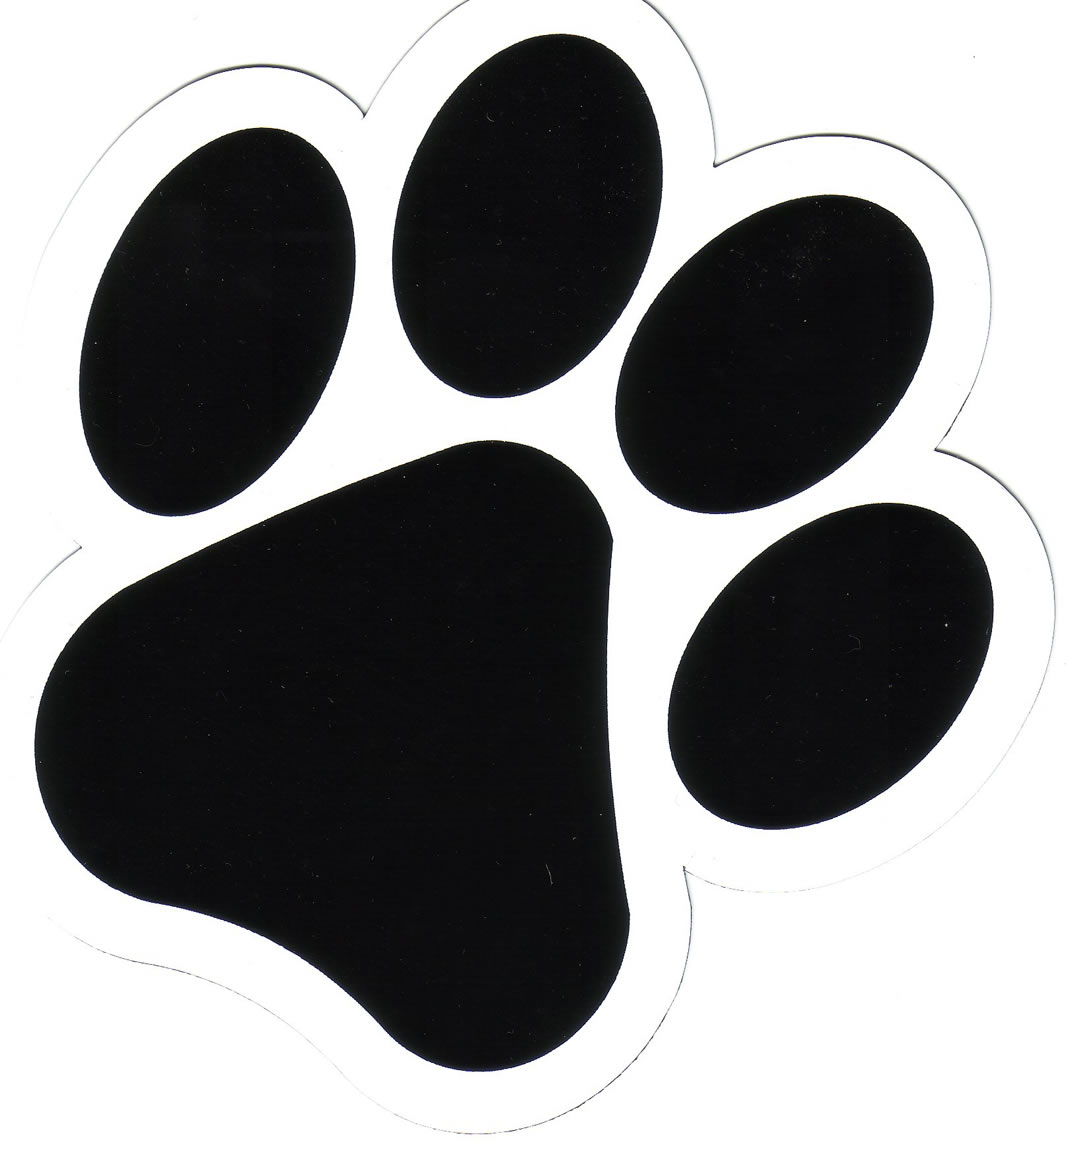 1066x1152 Paw Print Tattoos On Dog Paw Prints Scroll Clipart 3 8 3